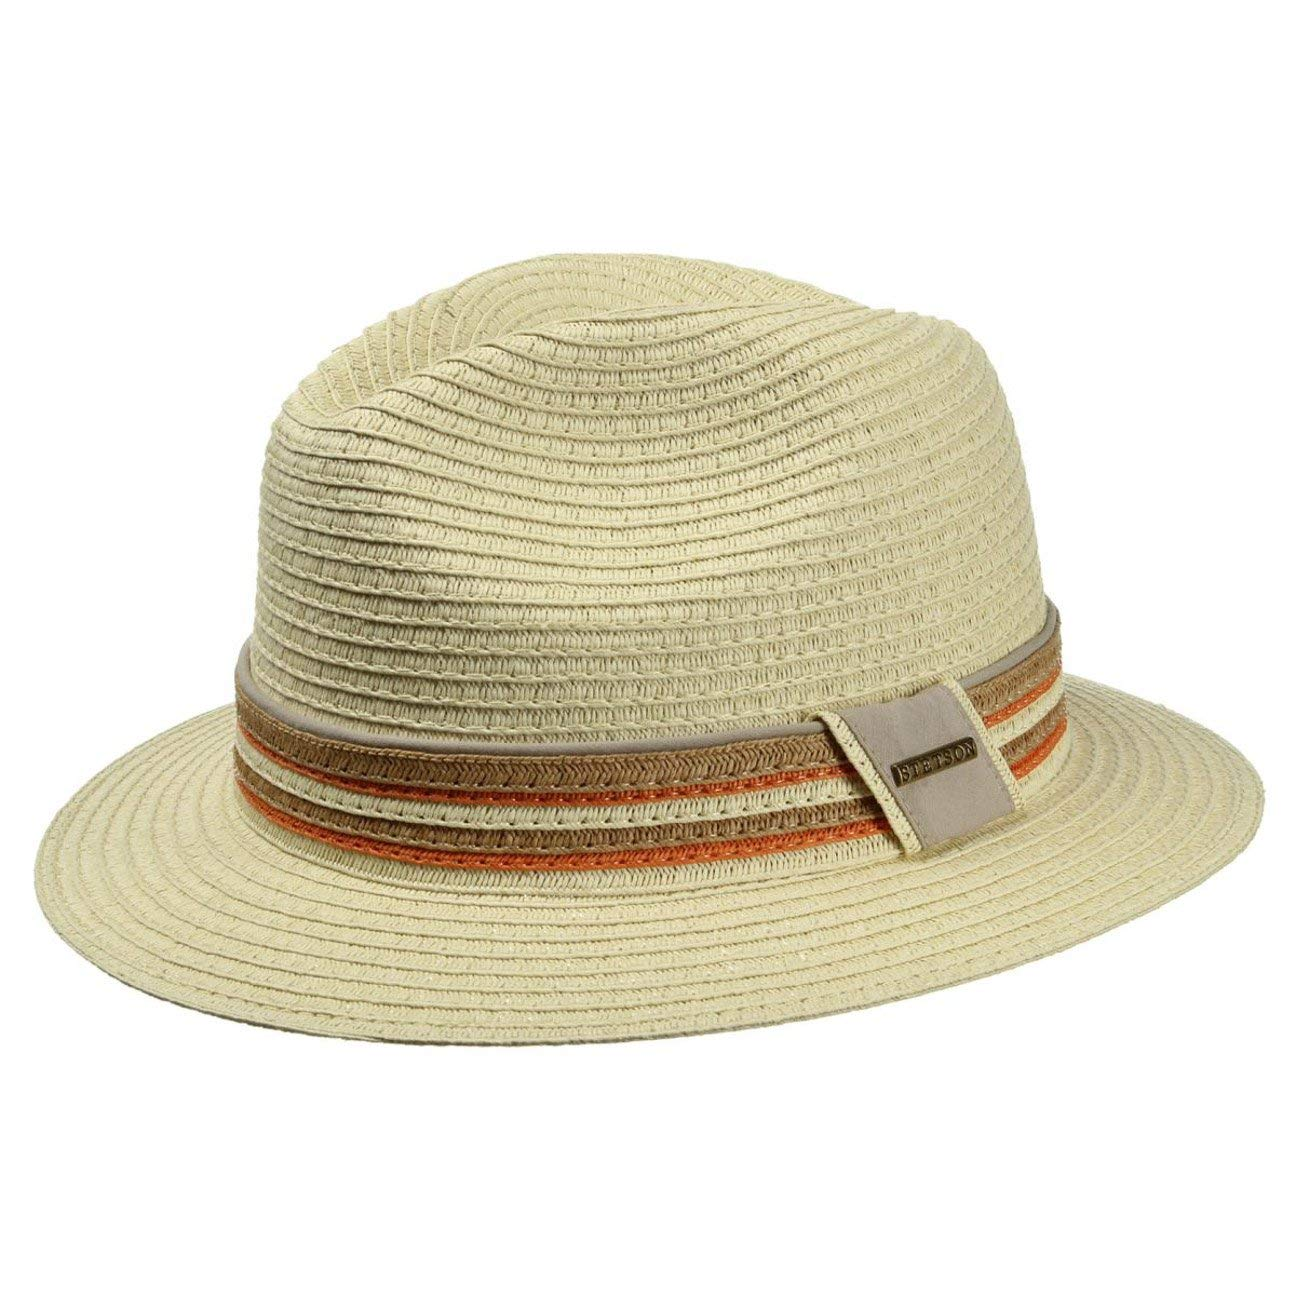 Stetson Ardmore Fedora Hat Men | Straw Bogart Holiday Spring-Summer